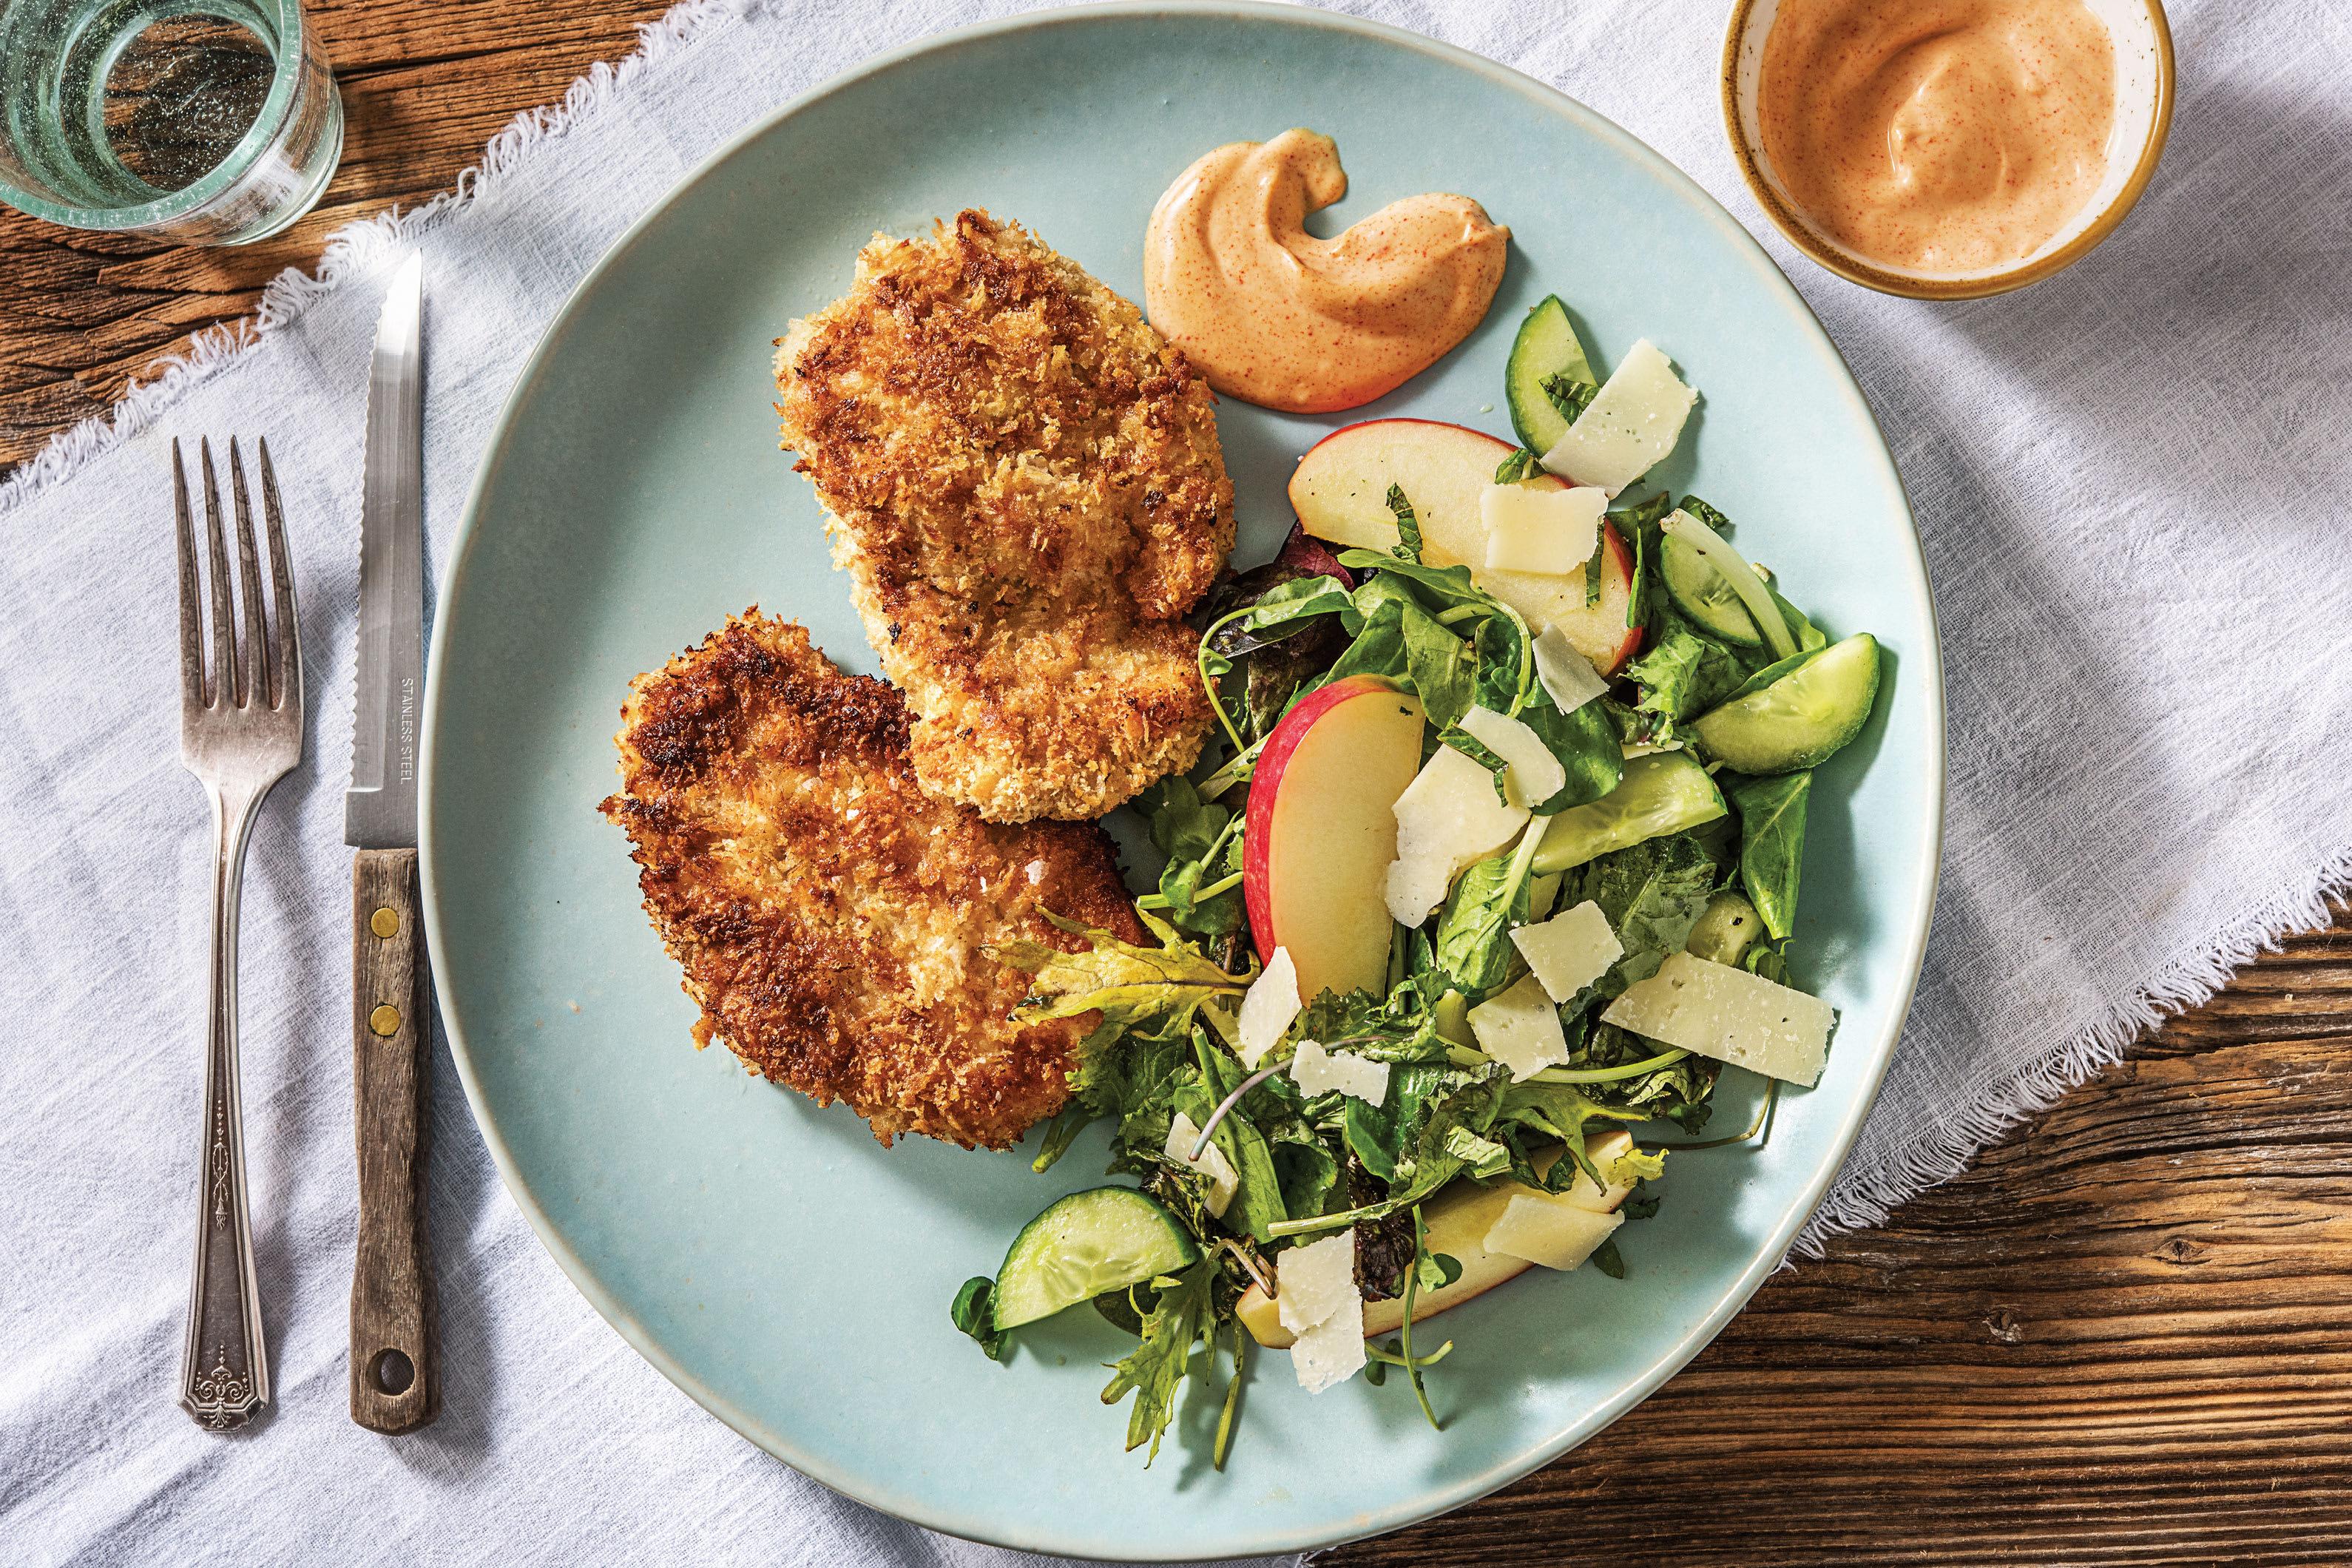 Pork Schnitzel & Apple Parmesan Salad